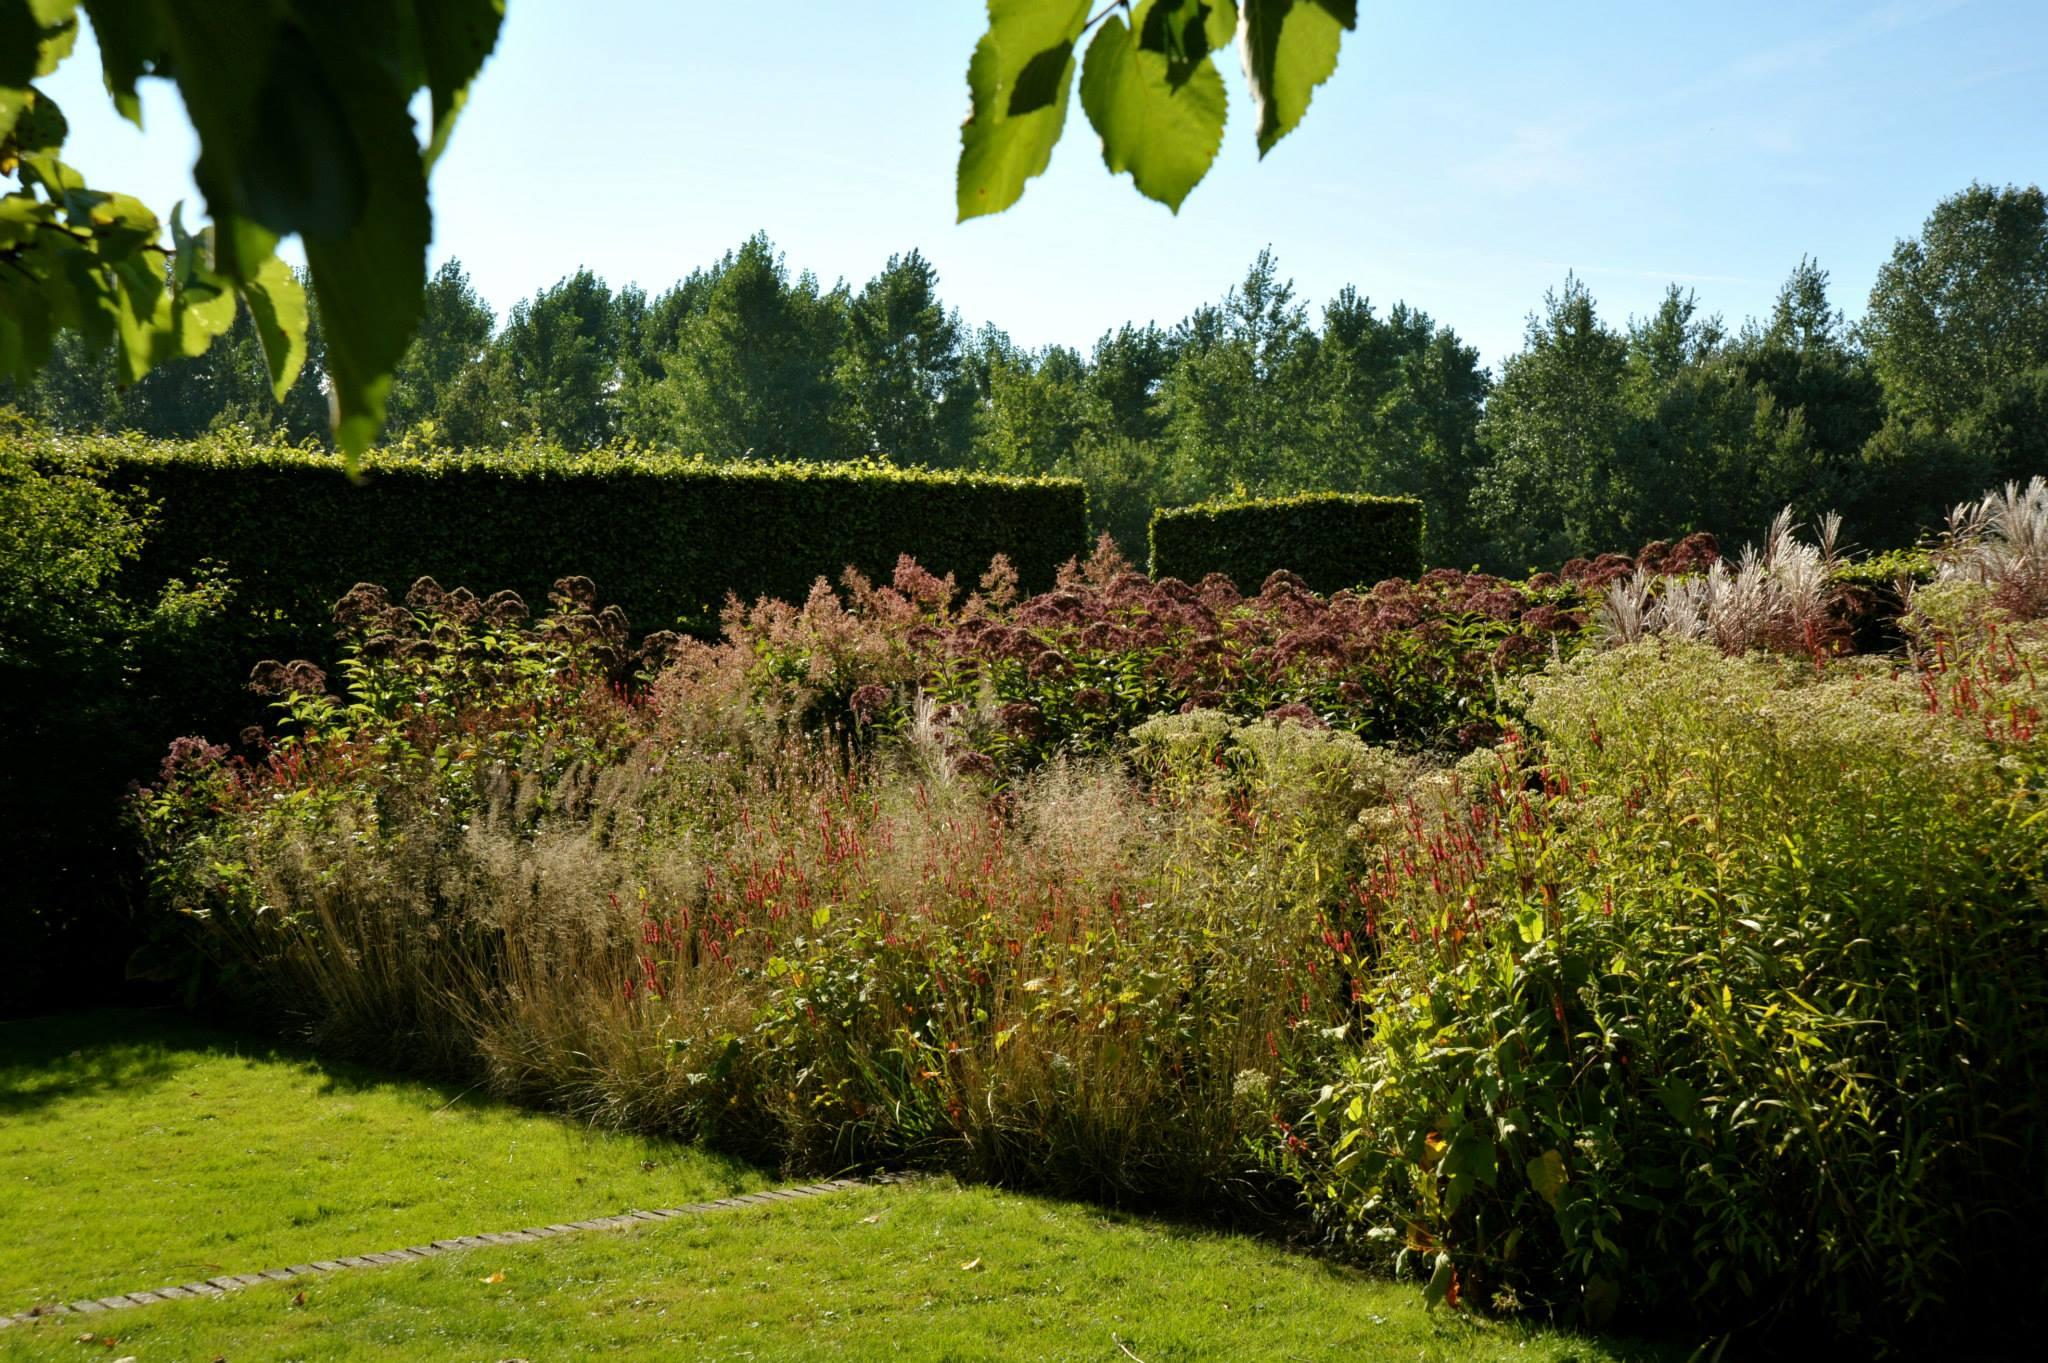 Brown is also a color herfst bij piet oudolf in hummelo for Piet oudolf pflanzplan